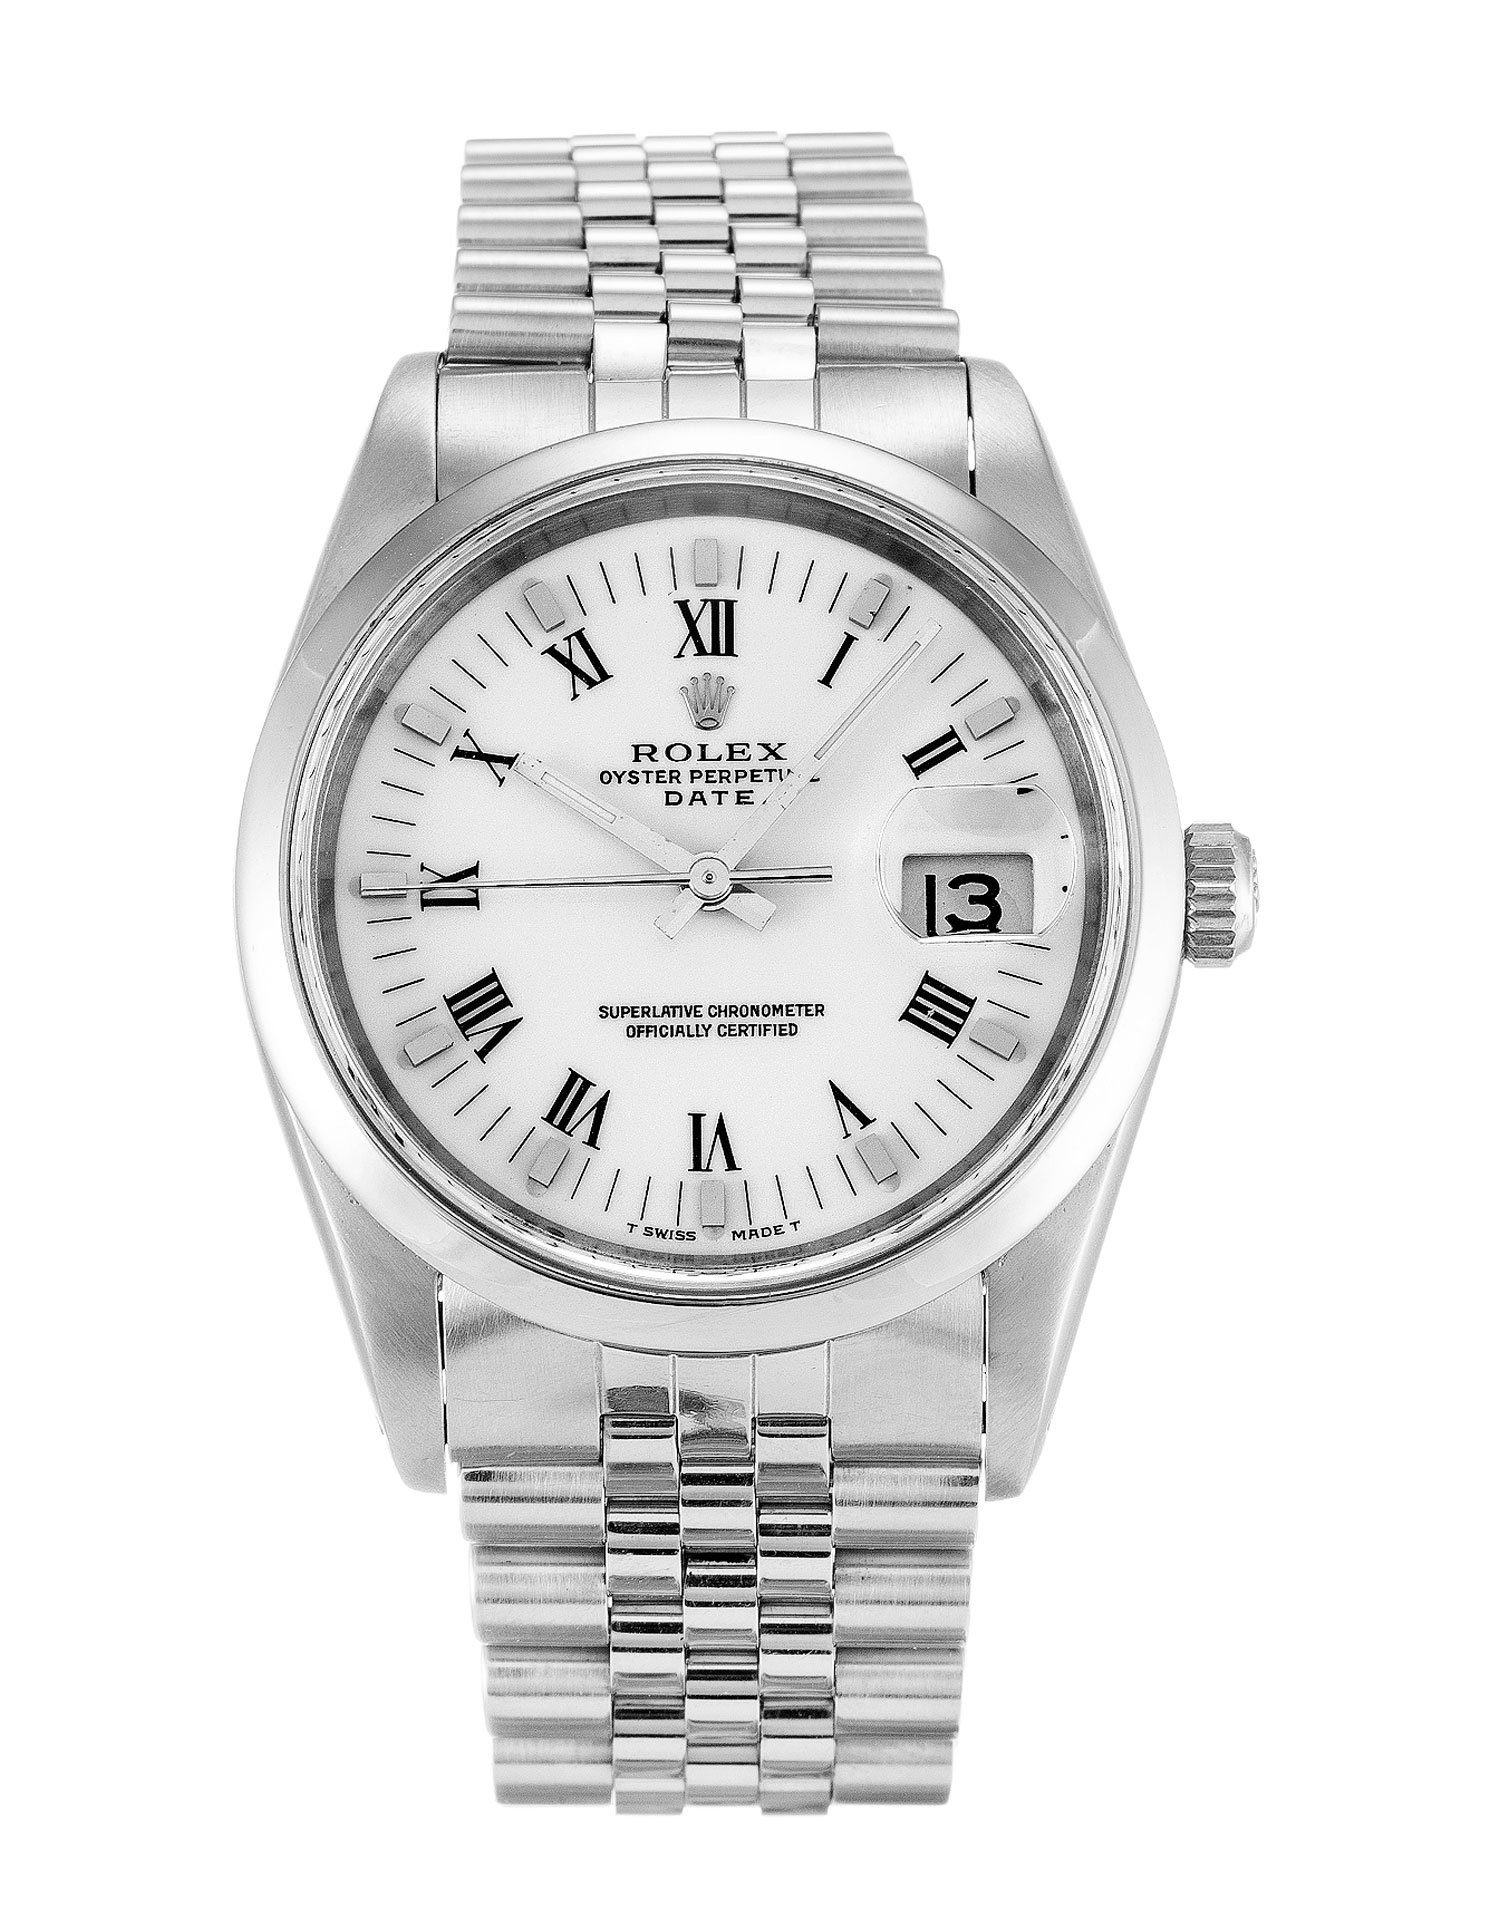 Rolex Oyster Perpetual Date 15200/2 ...